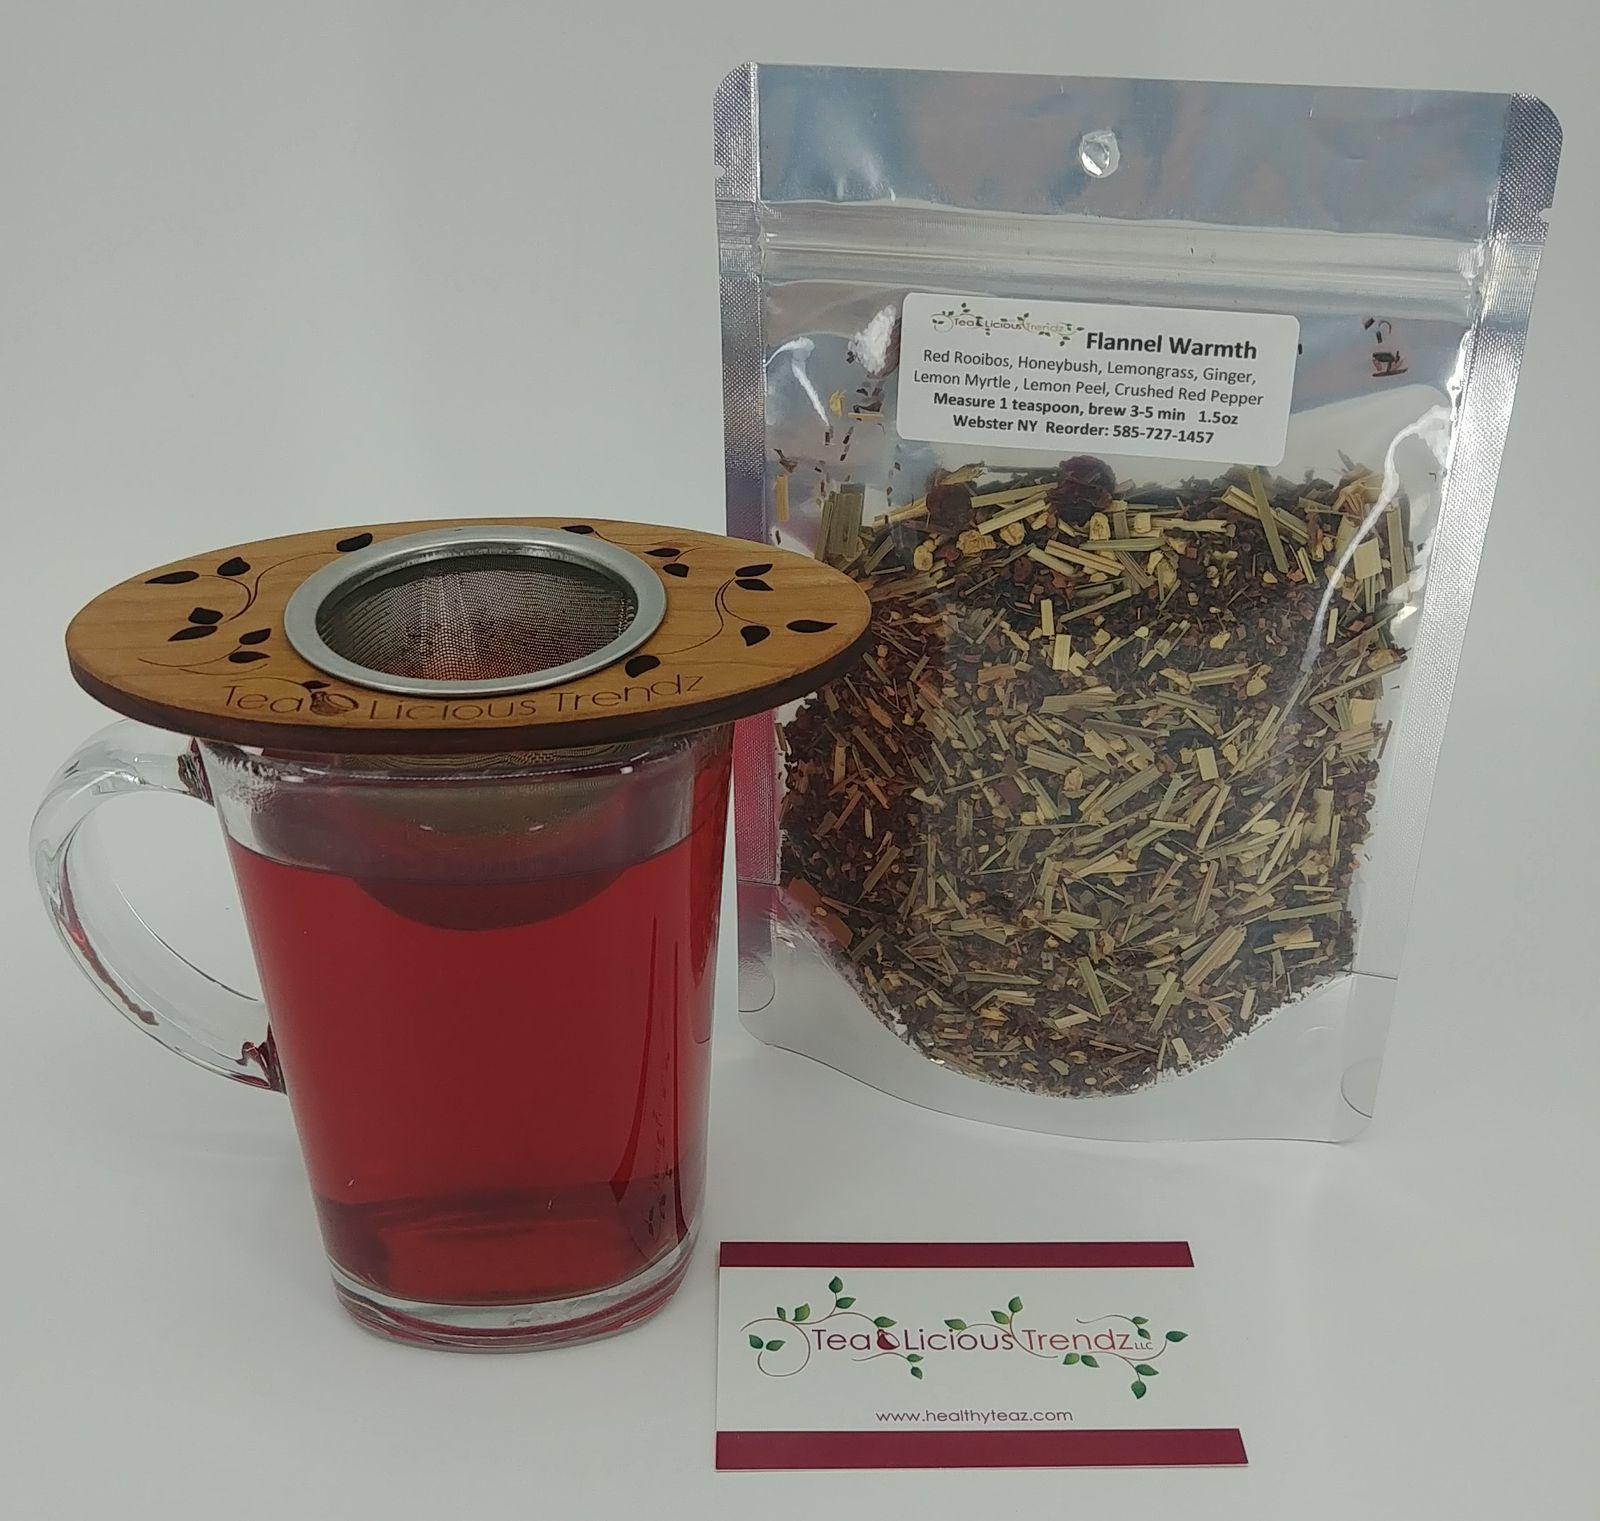 Tea-Licious Trendz